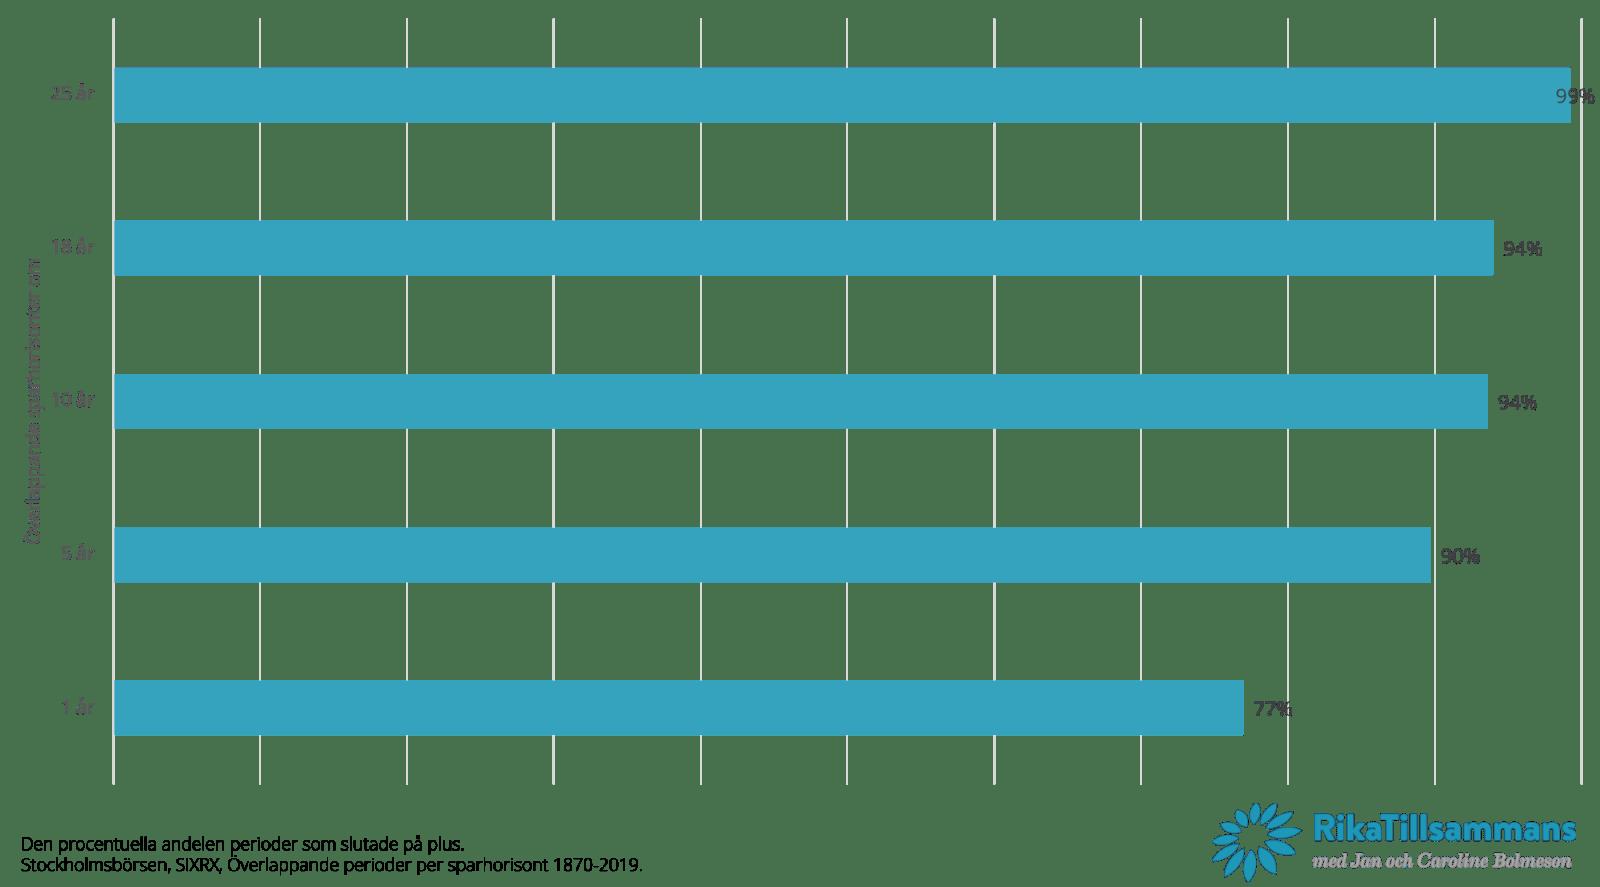 Antalet perioder som slutade på plus på Stockholmsbörsen per sparhorisont.